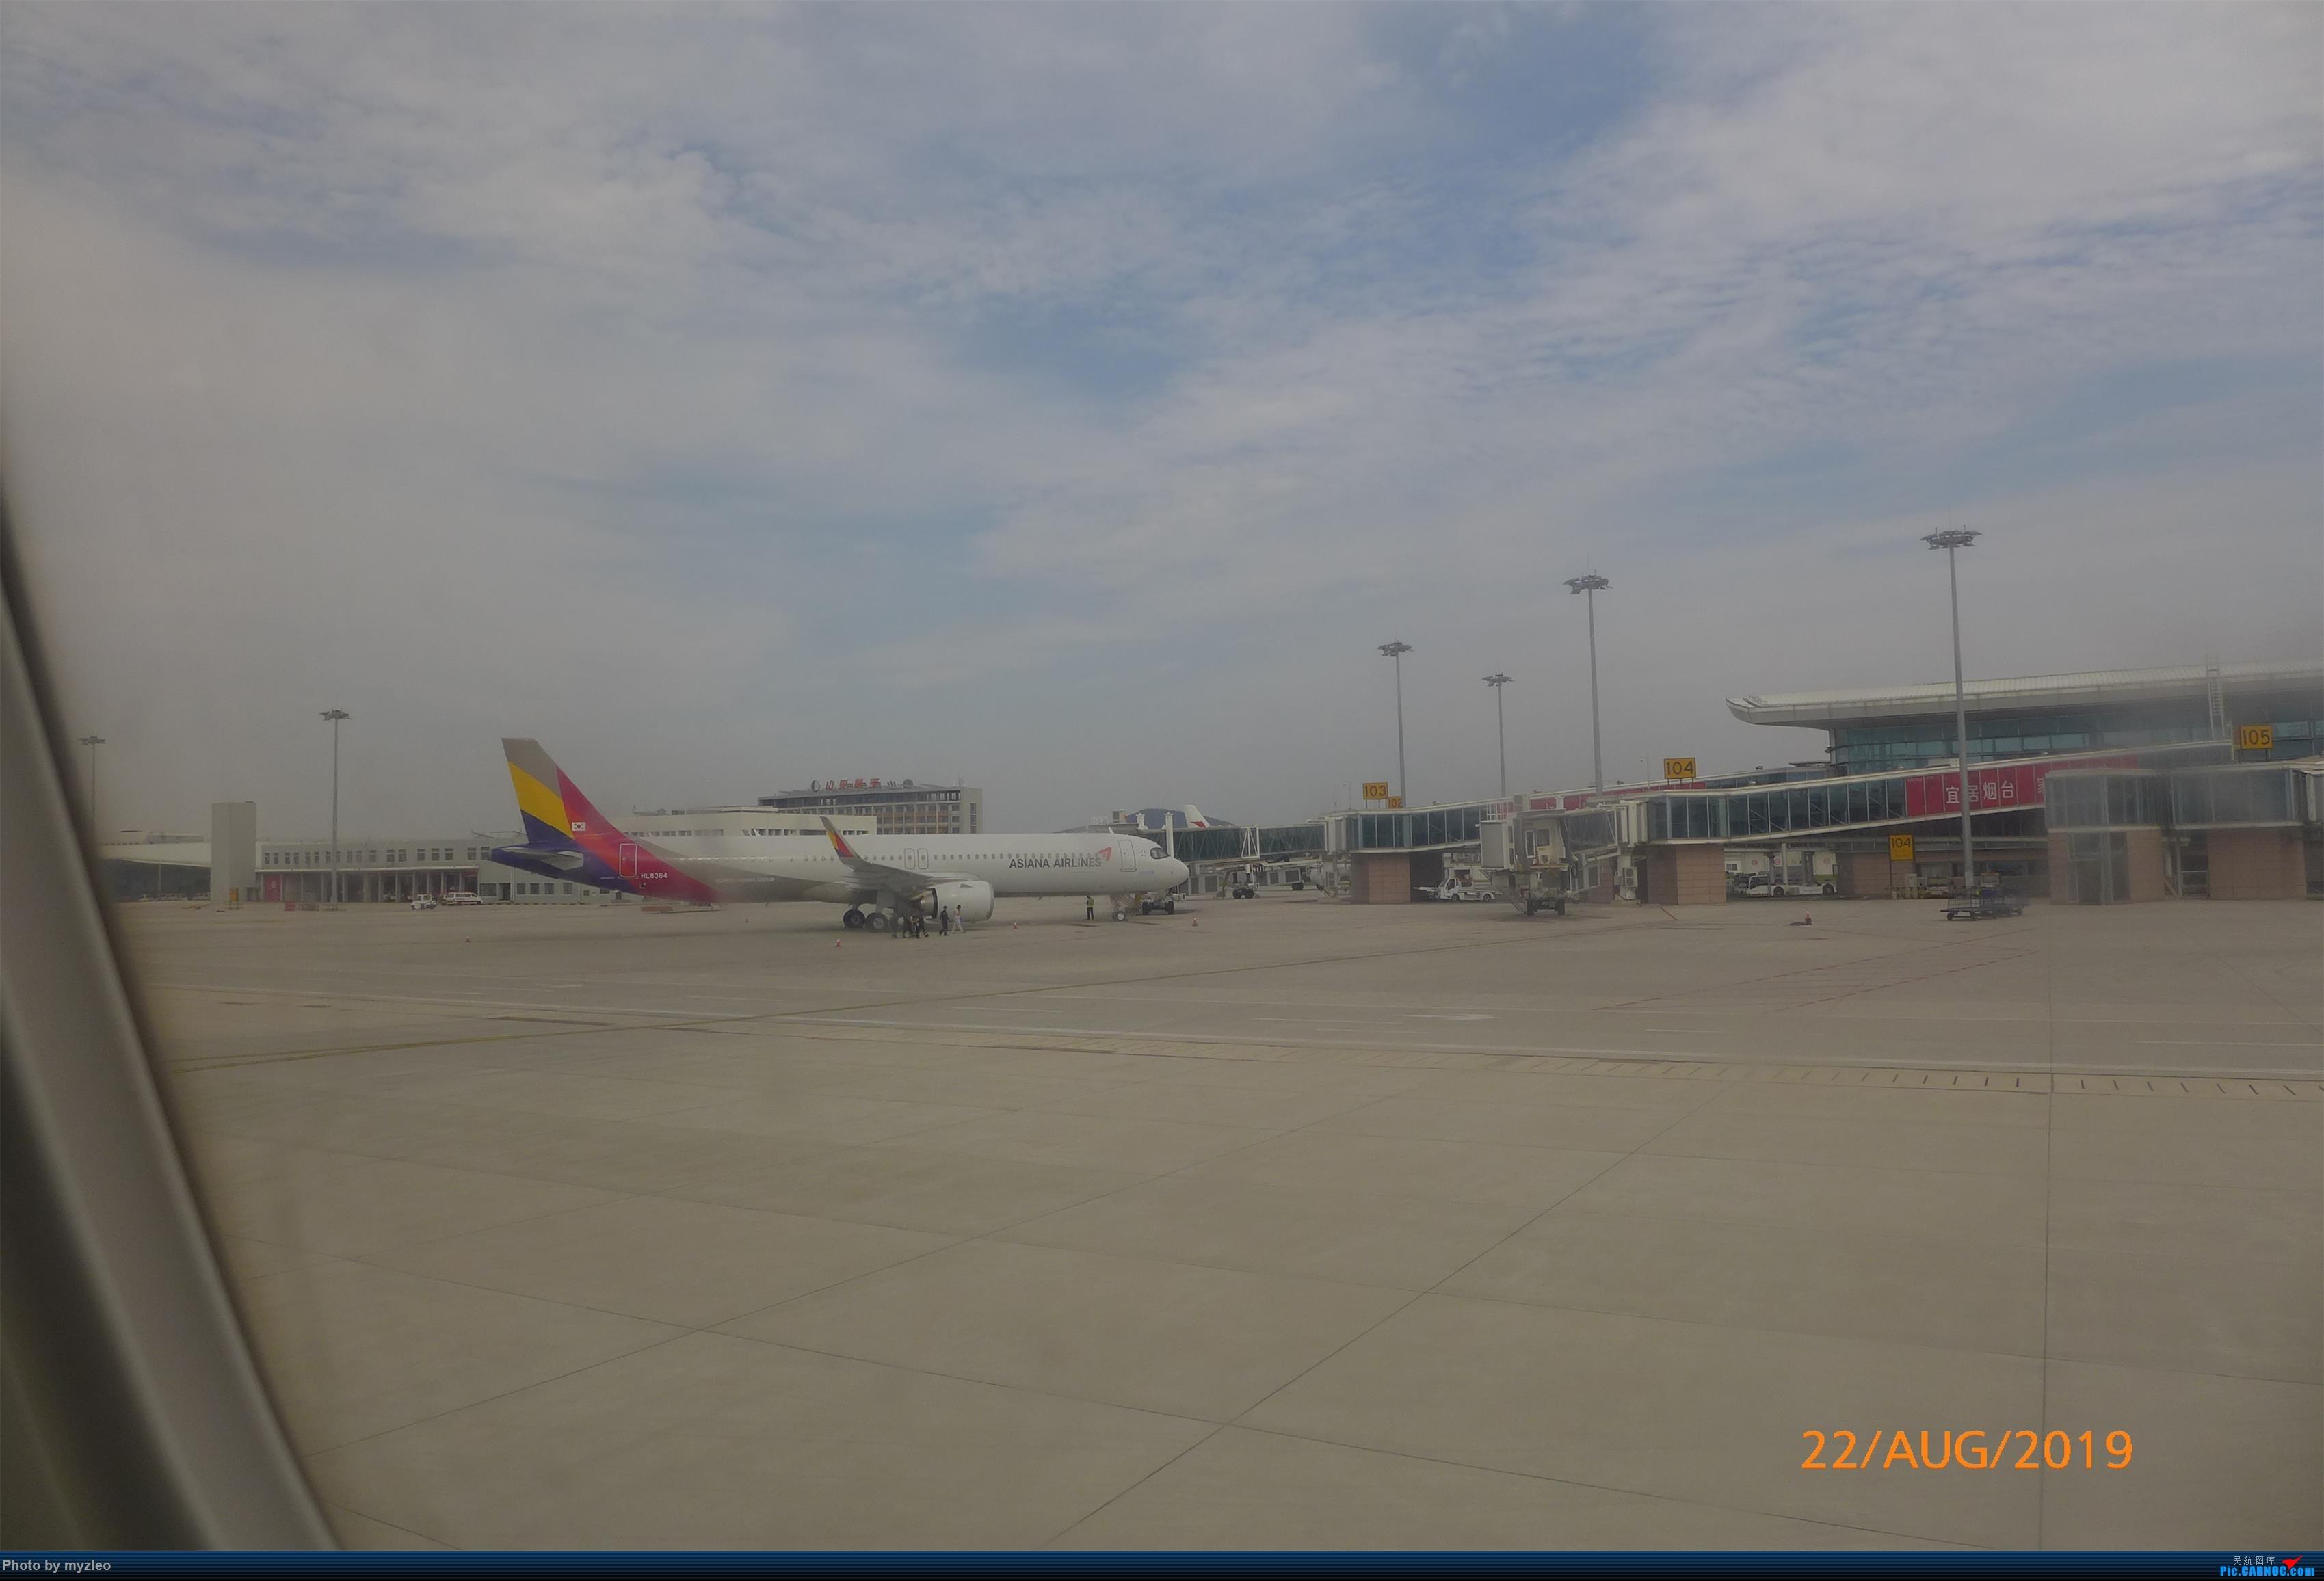 Re:[原创]【myzleo的游记5.2】梦圆一九(2)首访南苑把梦圆,初搭巴航连新缘 AIRBUS A321NEO HL8364 中国烟台蓬莱国际机场